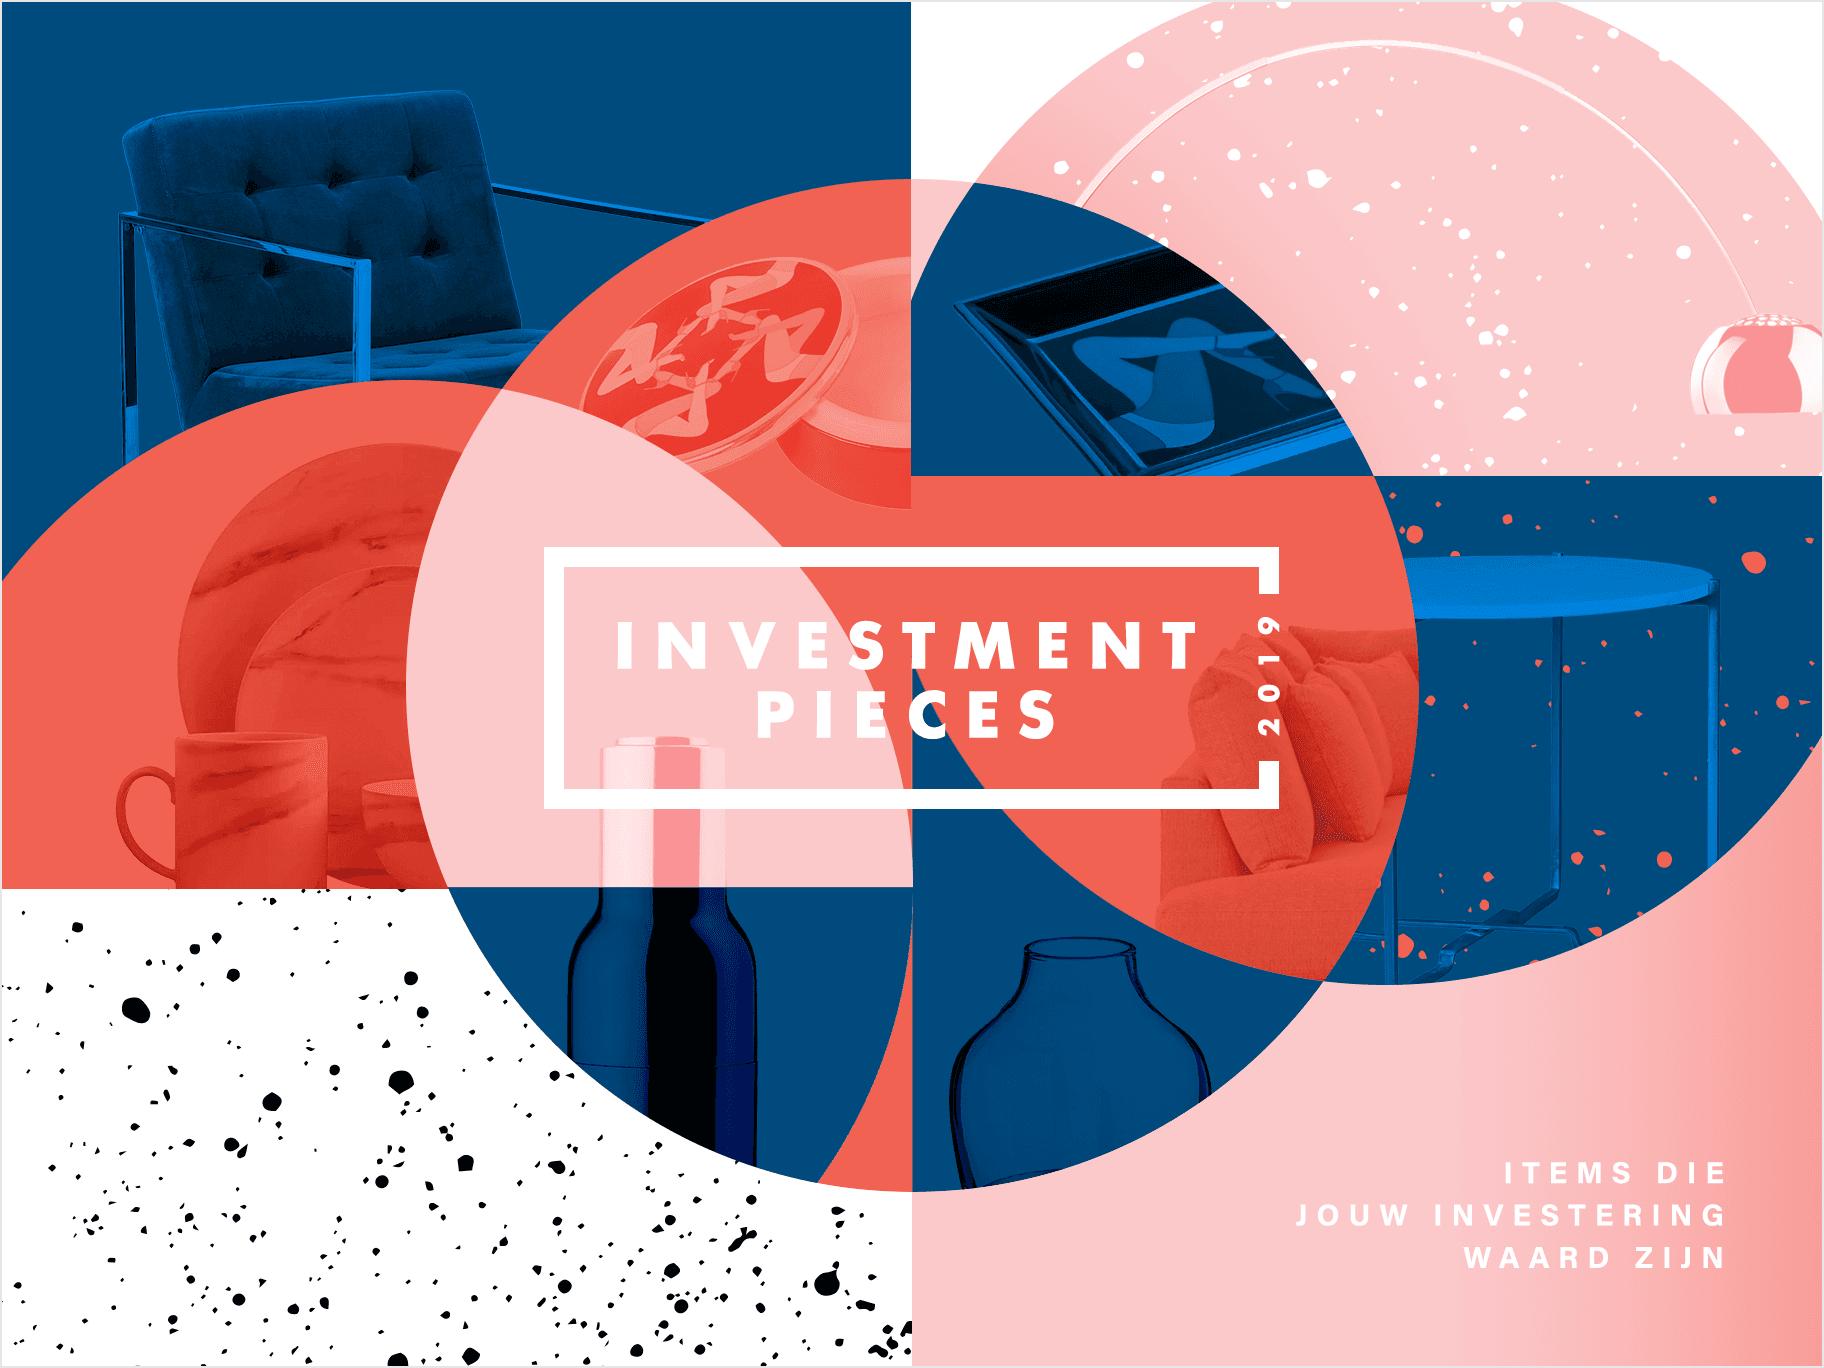 Investment pieces 2019